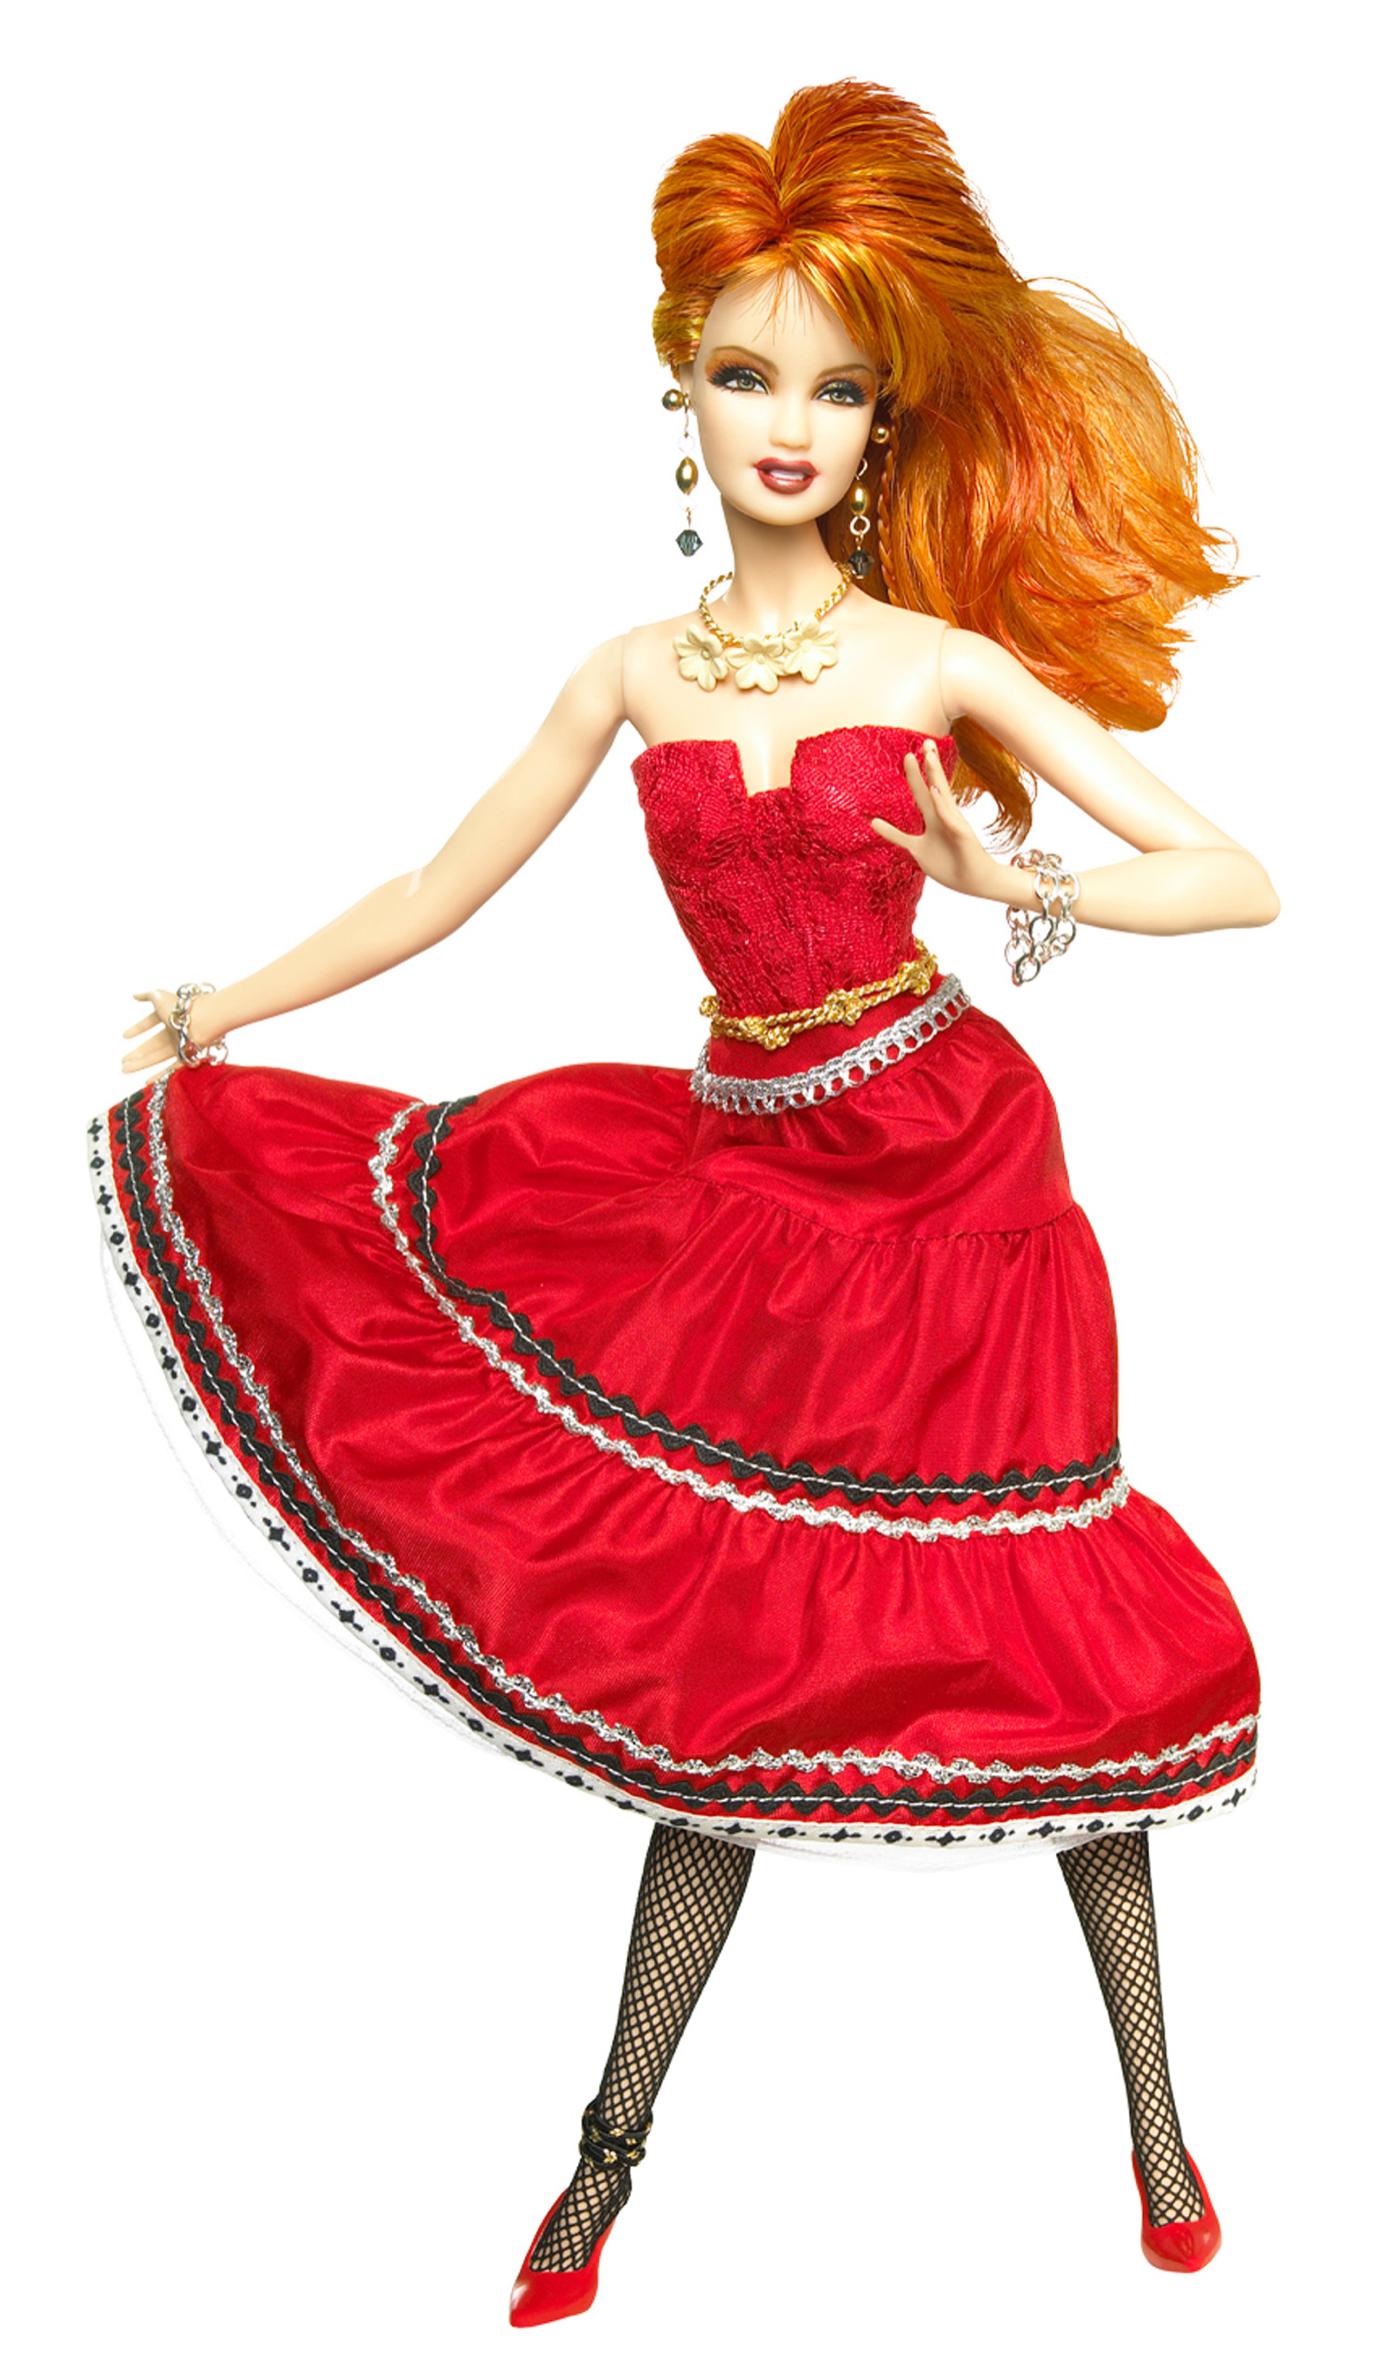 The Cyndi Lauper Barbie, released in 2010.